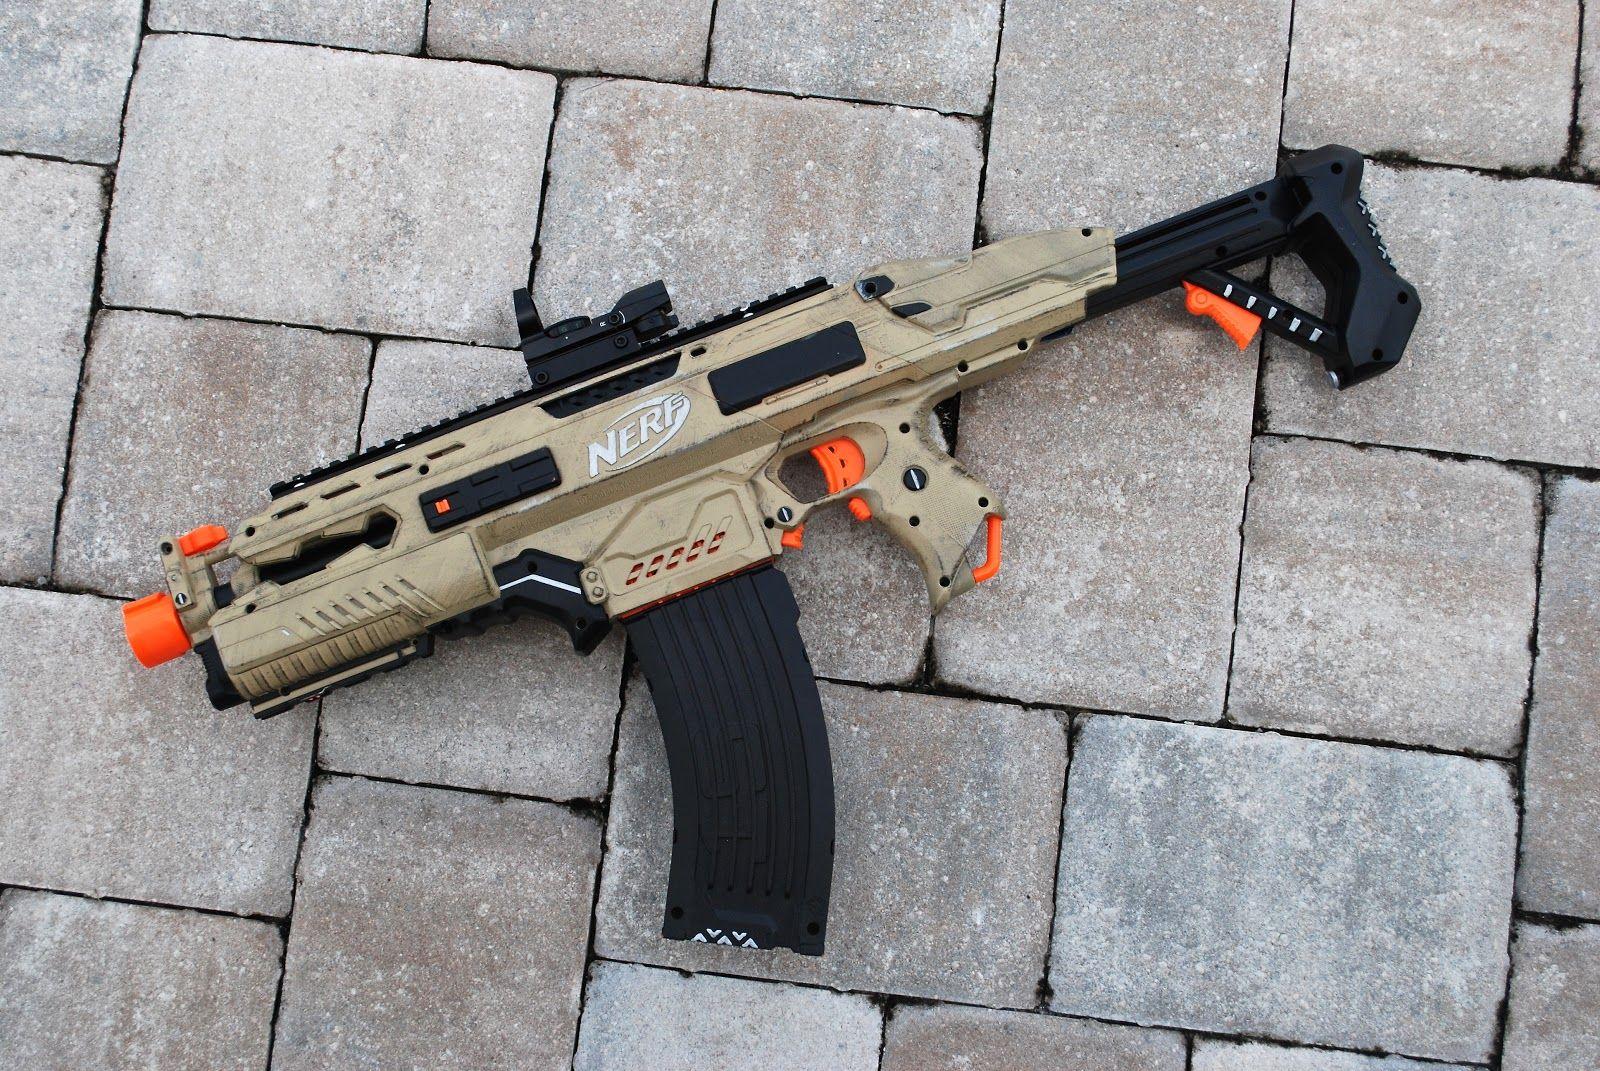 Image result for coop772 rapidstrike paint job · Nerf GunWingsNerf Rifle